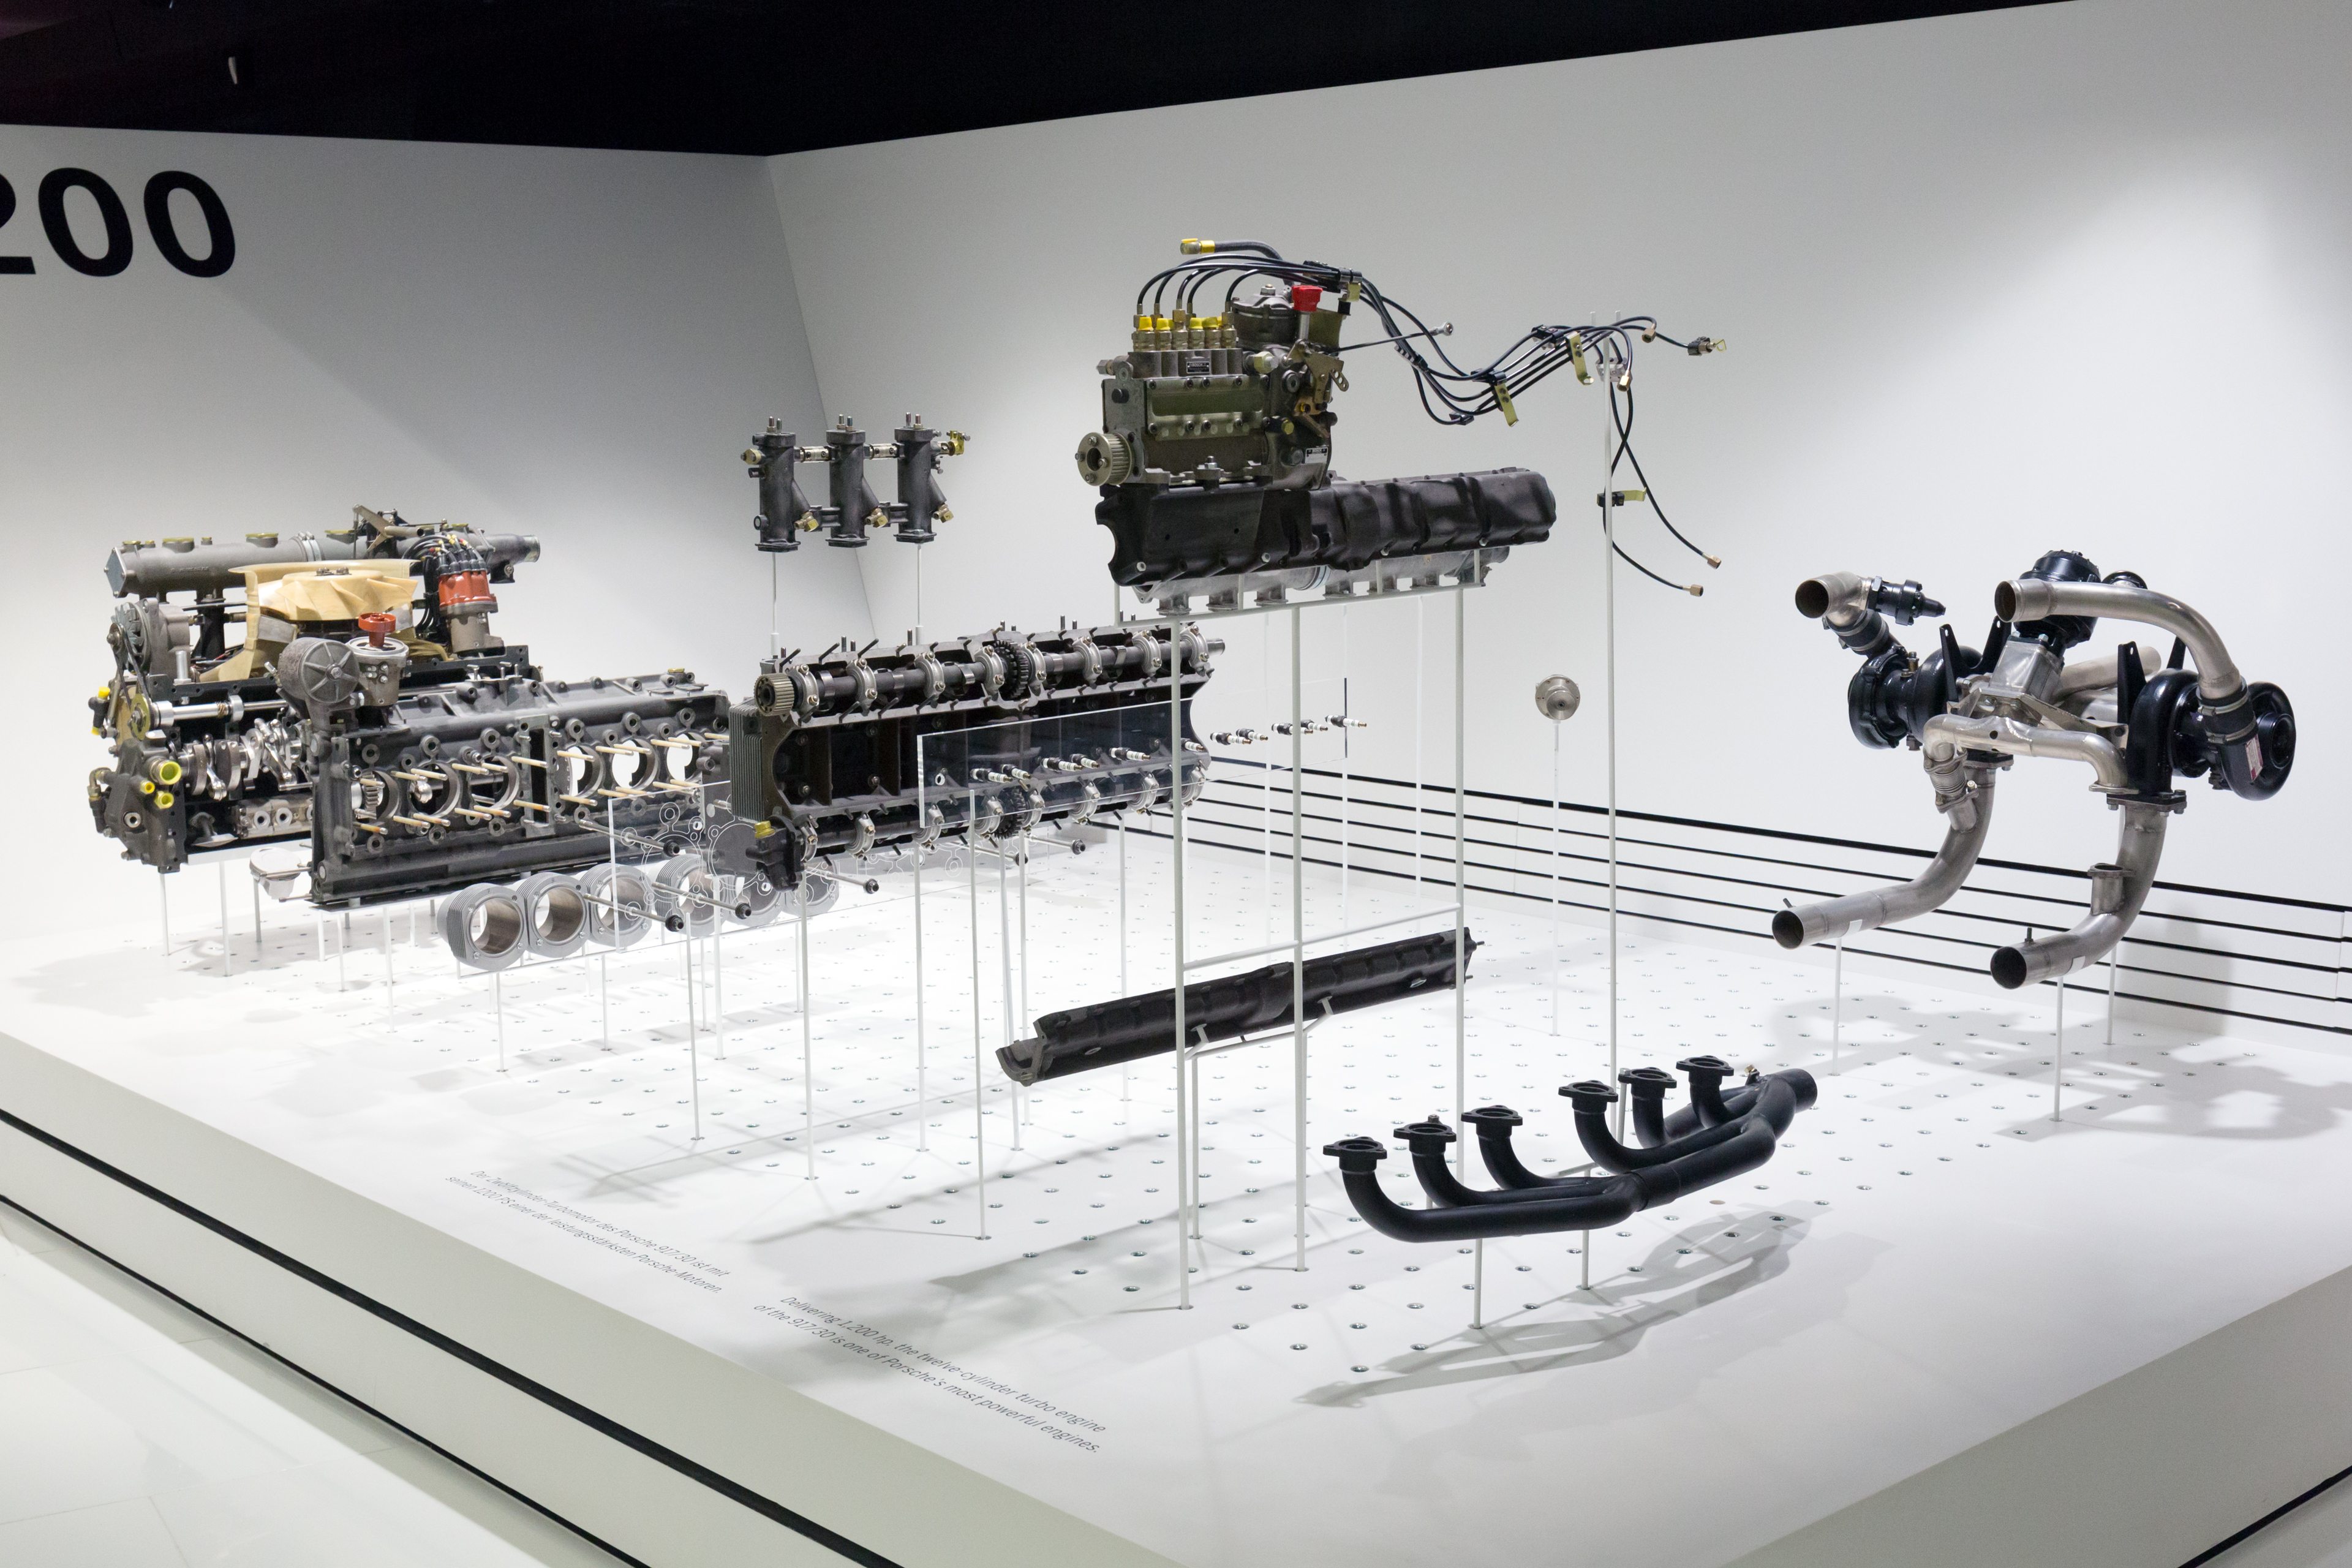 File Porsche 912 Engine For 917 30 Cutaway Porsche Museum Jpg Wikimedia Commons